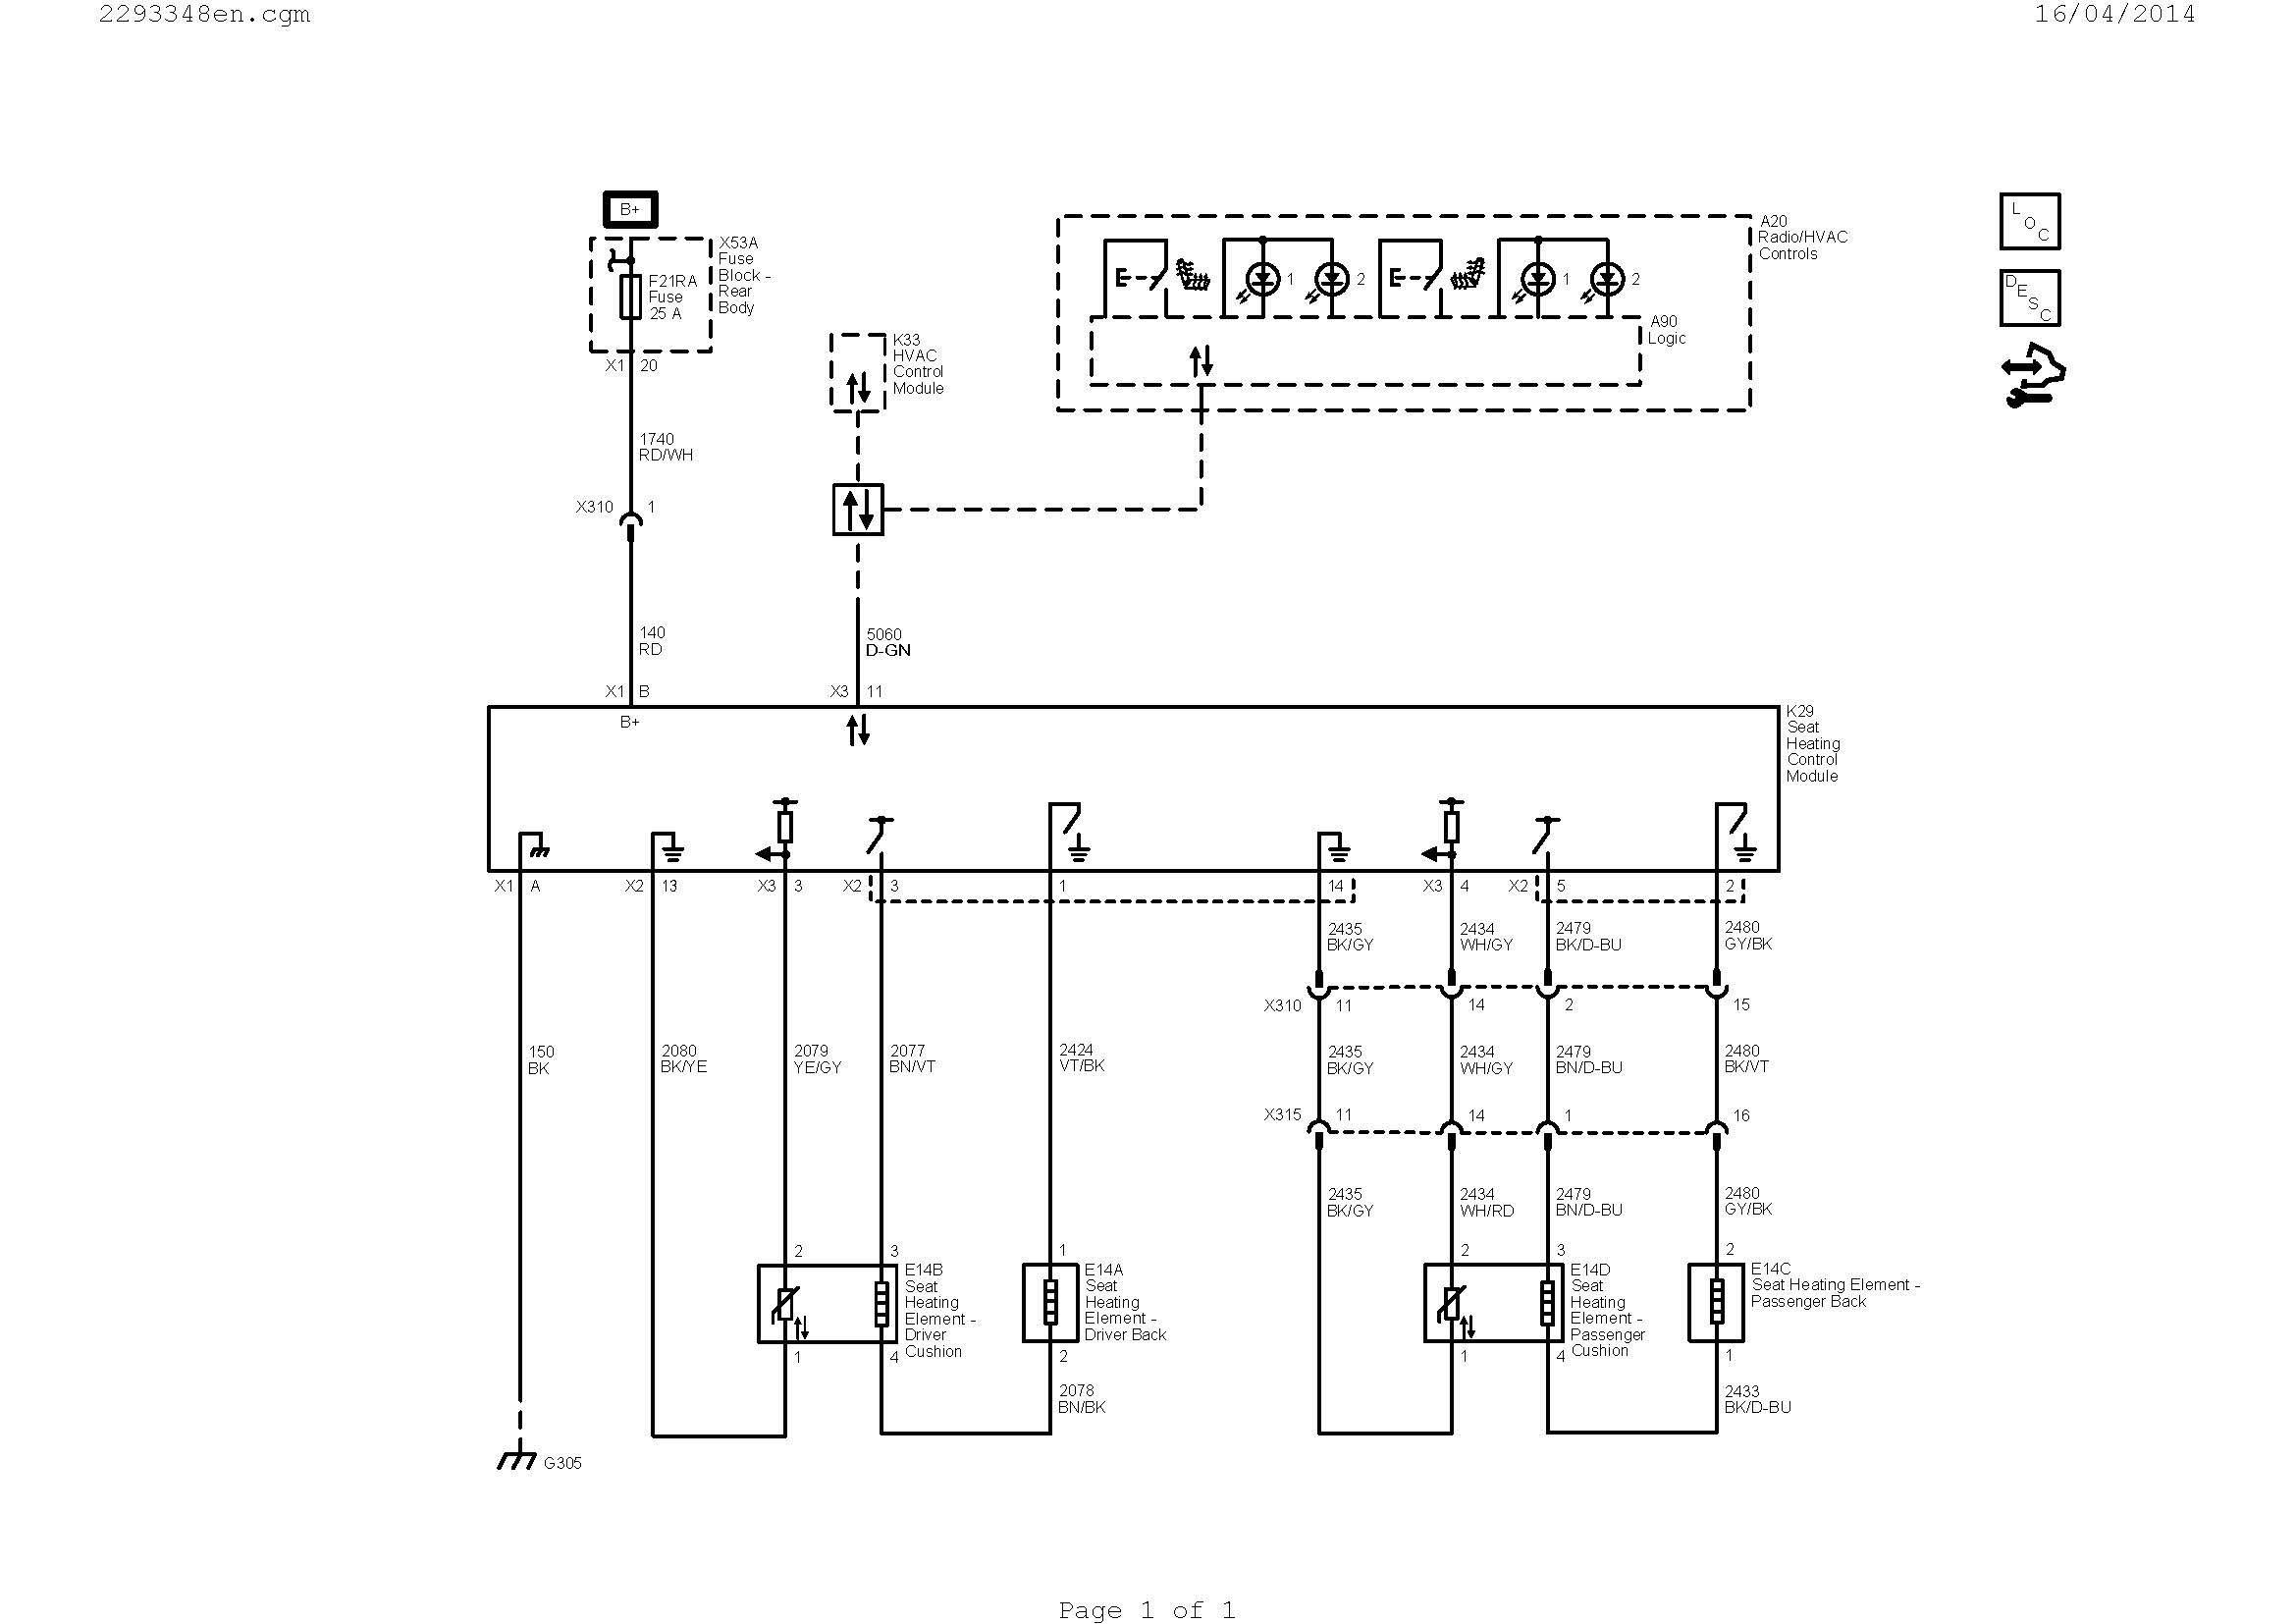 Wireless Remote Control Car Circuit Diagram Wireless Remote Control Car Circuit Diagrams Of Wireless Remote Control Car Circuit Diagram